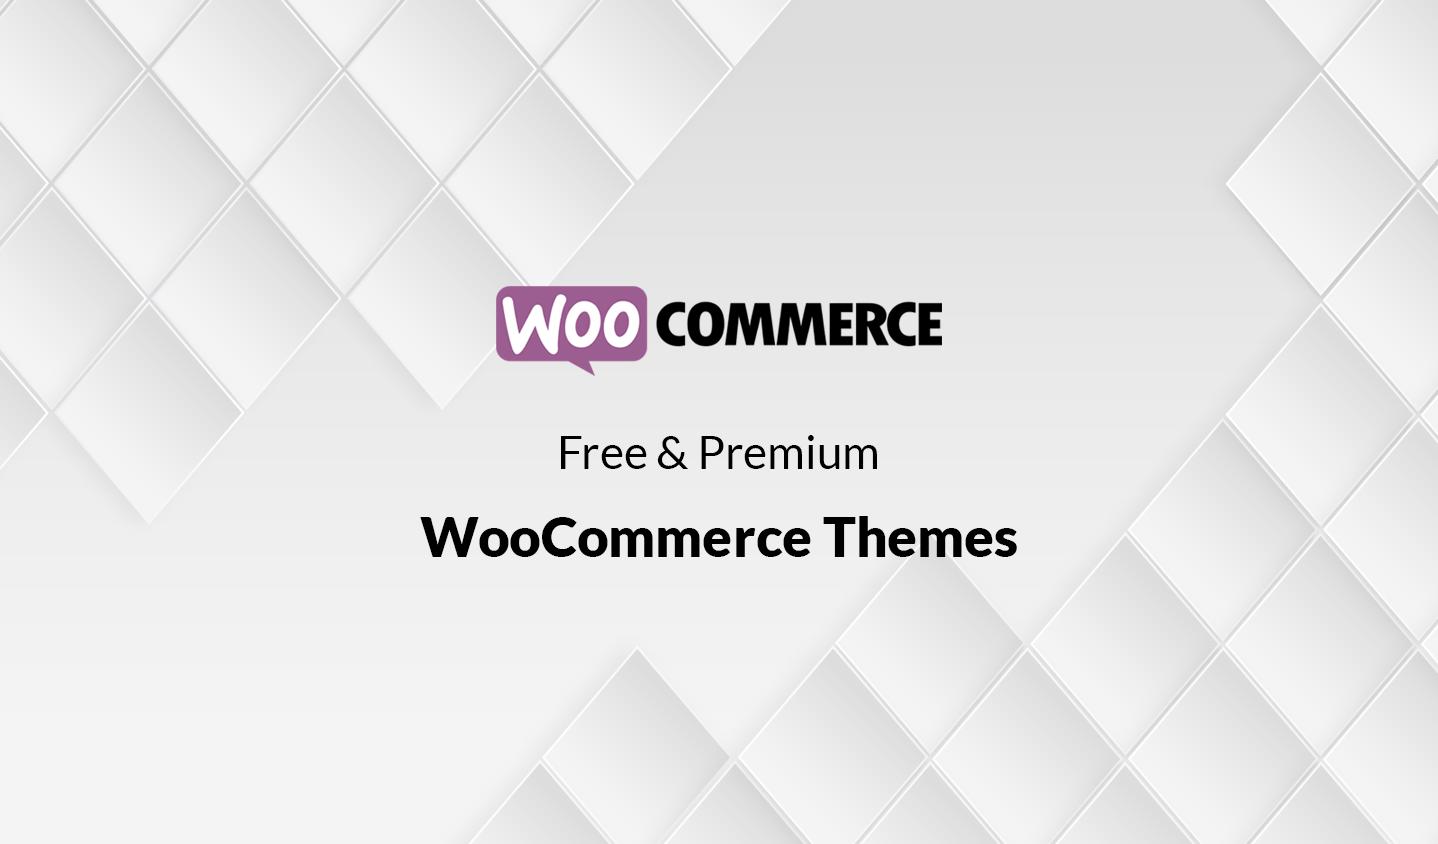 Free and Premium Responsive WooCommerce Themes